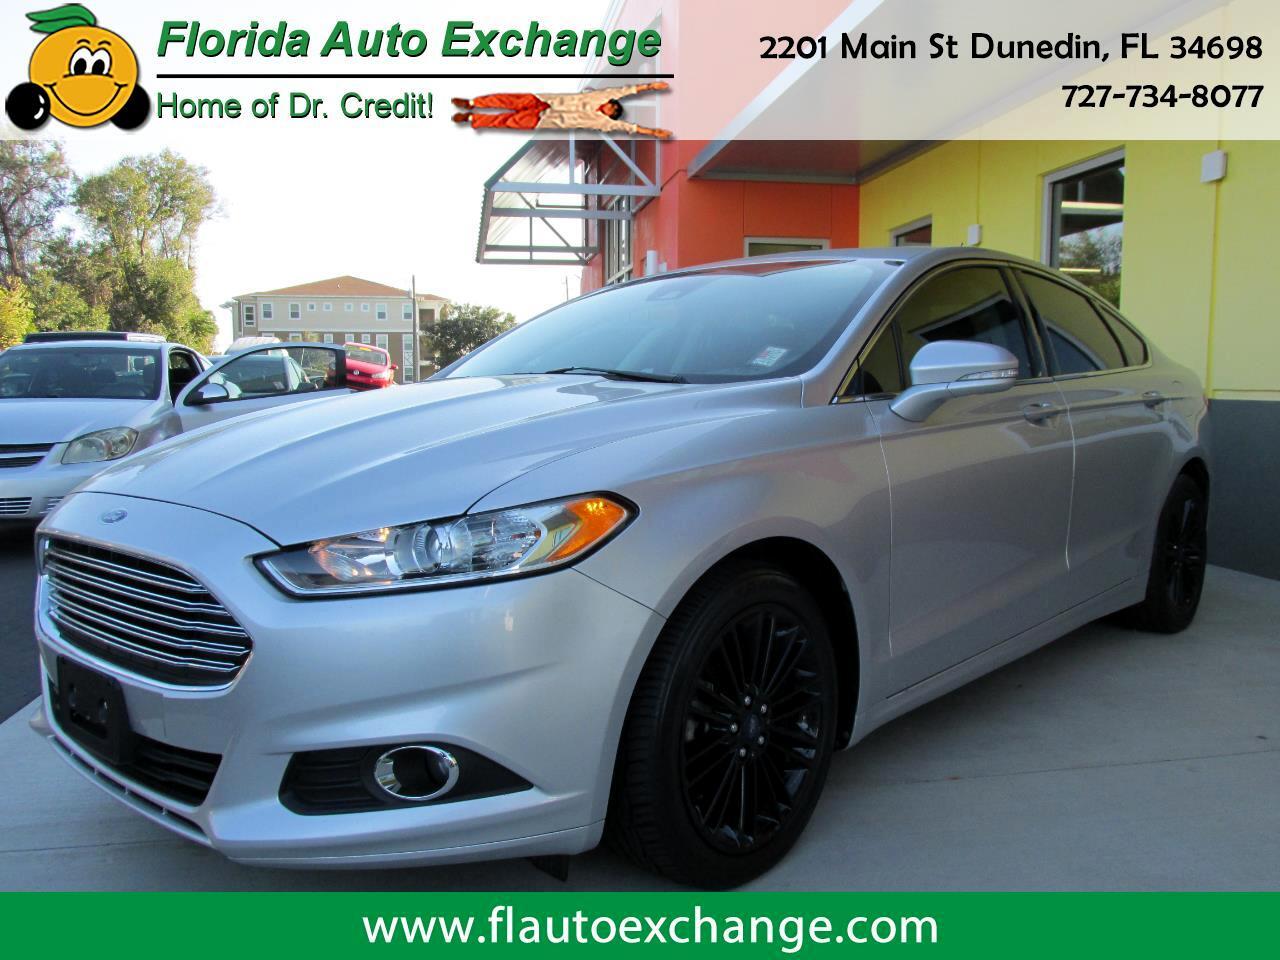 Ford Fusion 4dr Sdn SE FWD 2014